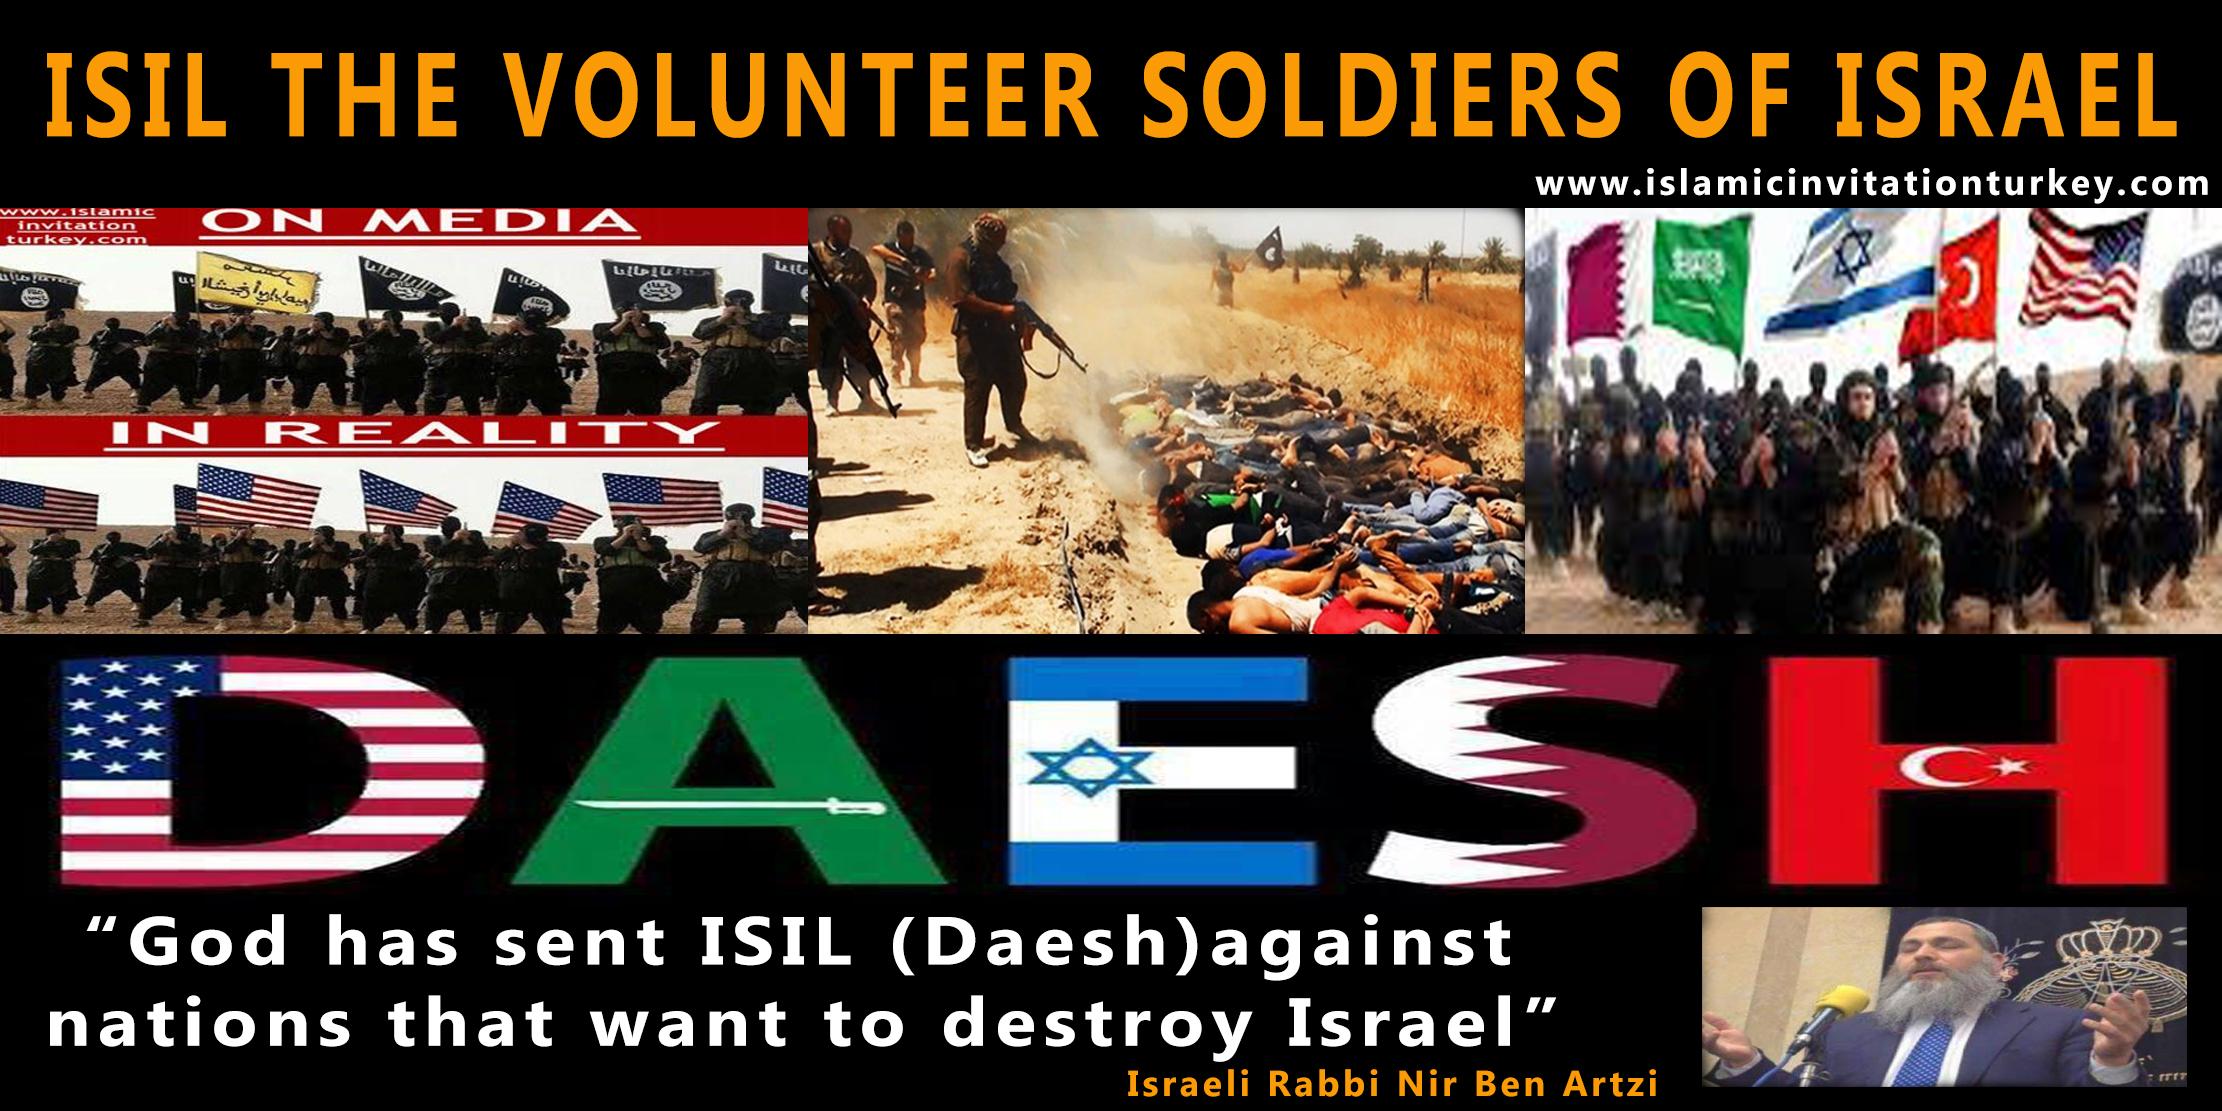 Photo of Inhuman israeli regime propping up al-Nusra Front in Syria: Analyst